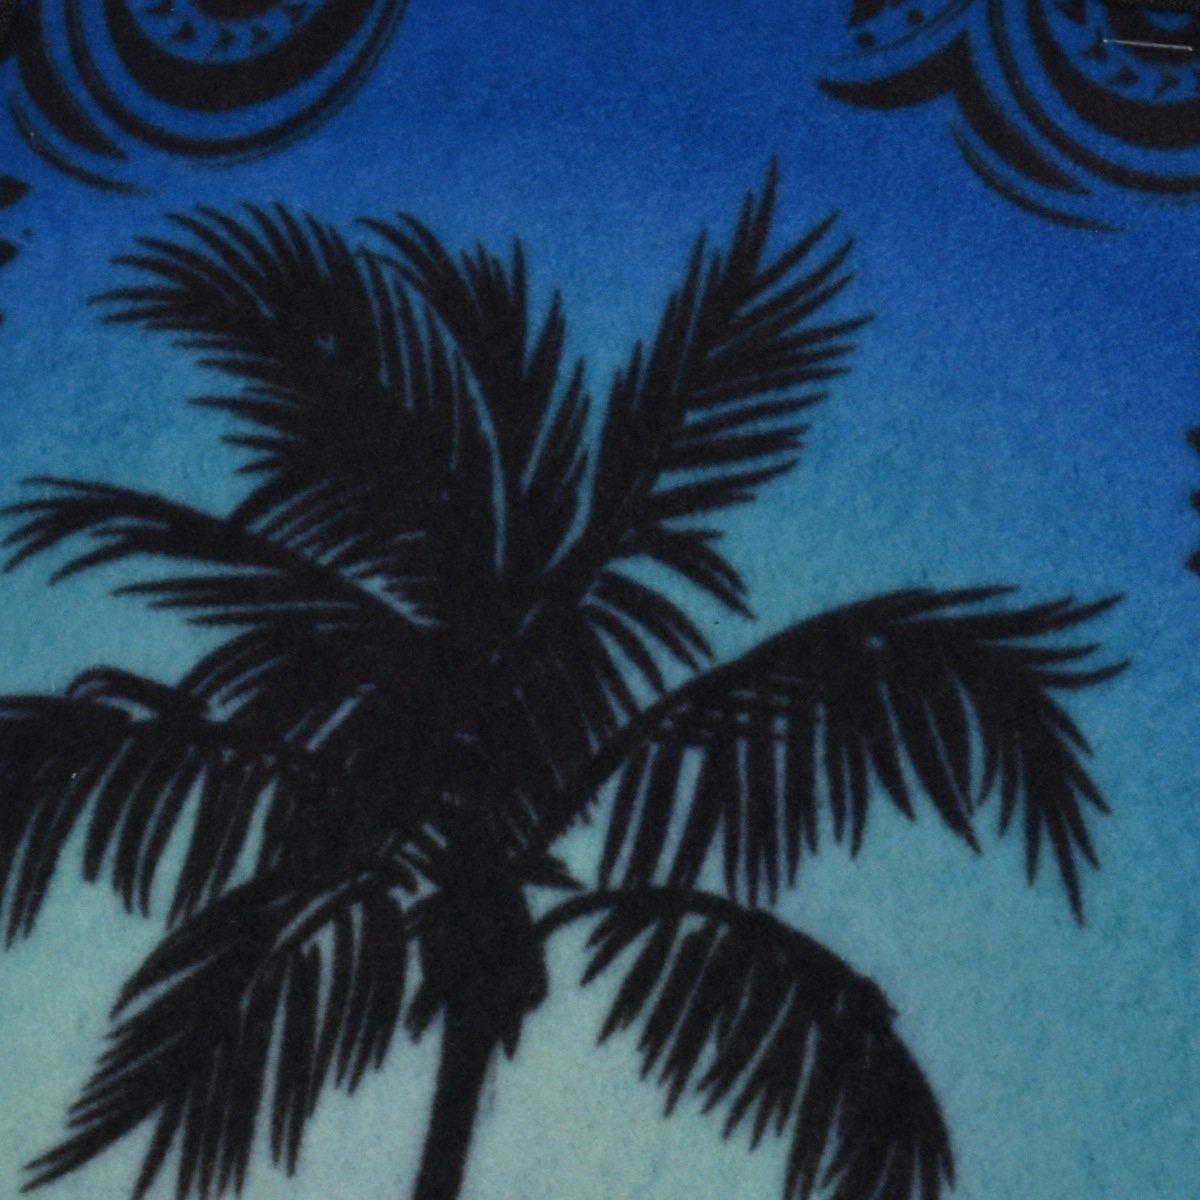 Licensed Products, Secure Backing MT-454 Cherry Pattern BDK Universal Fit 4-Piece Design Carpet Floor Mat Set -